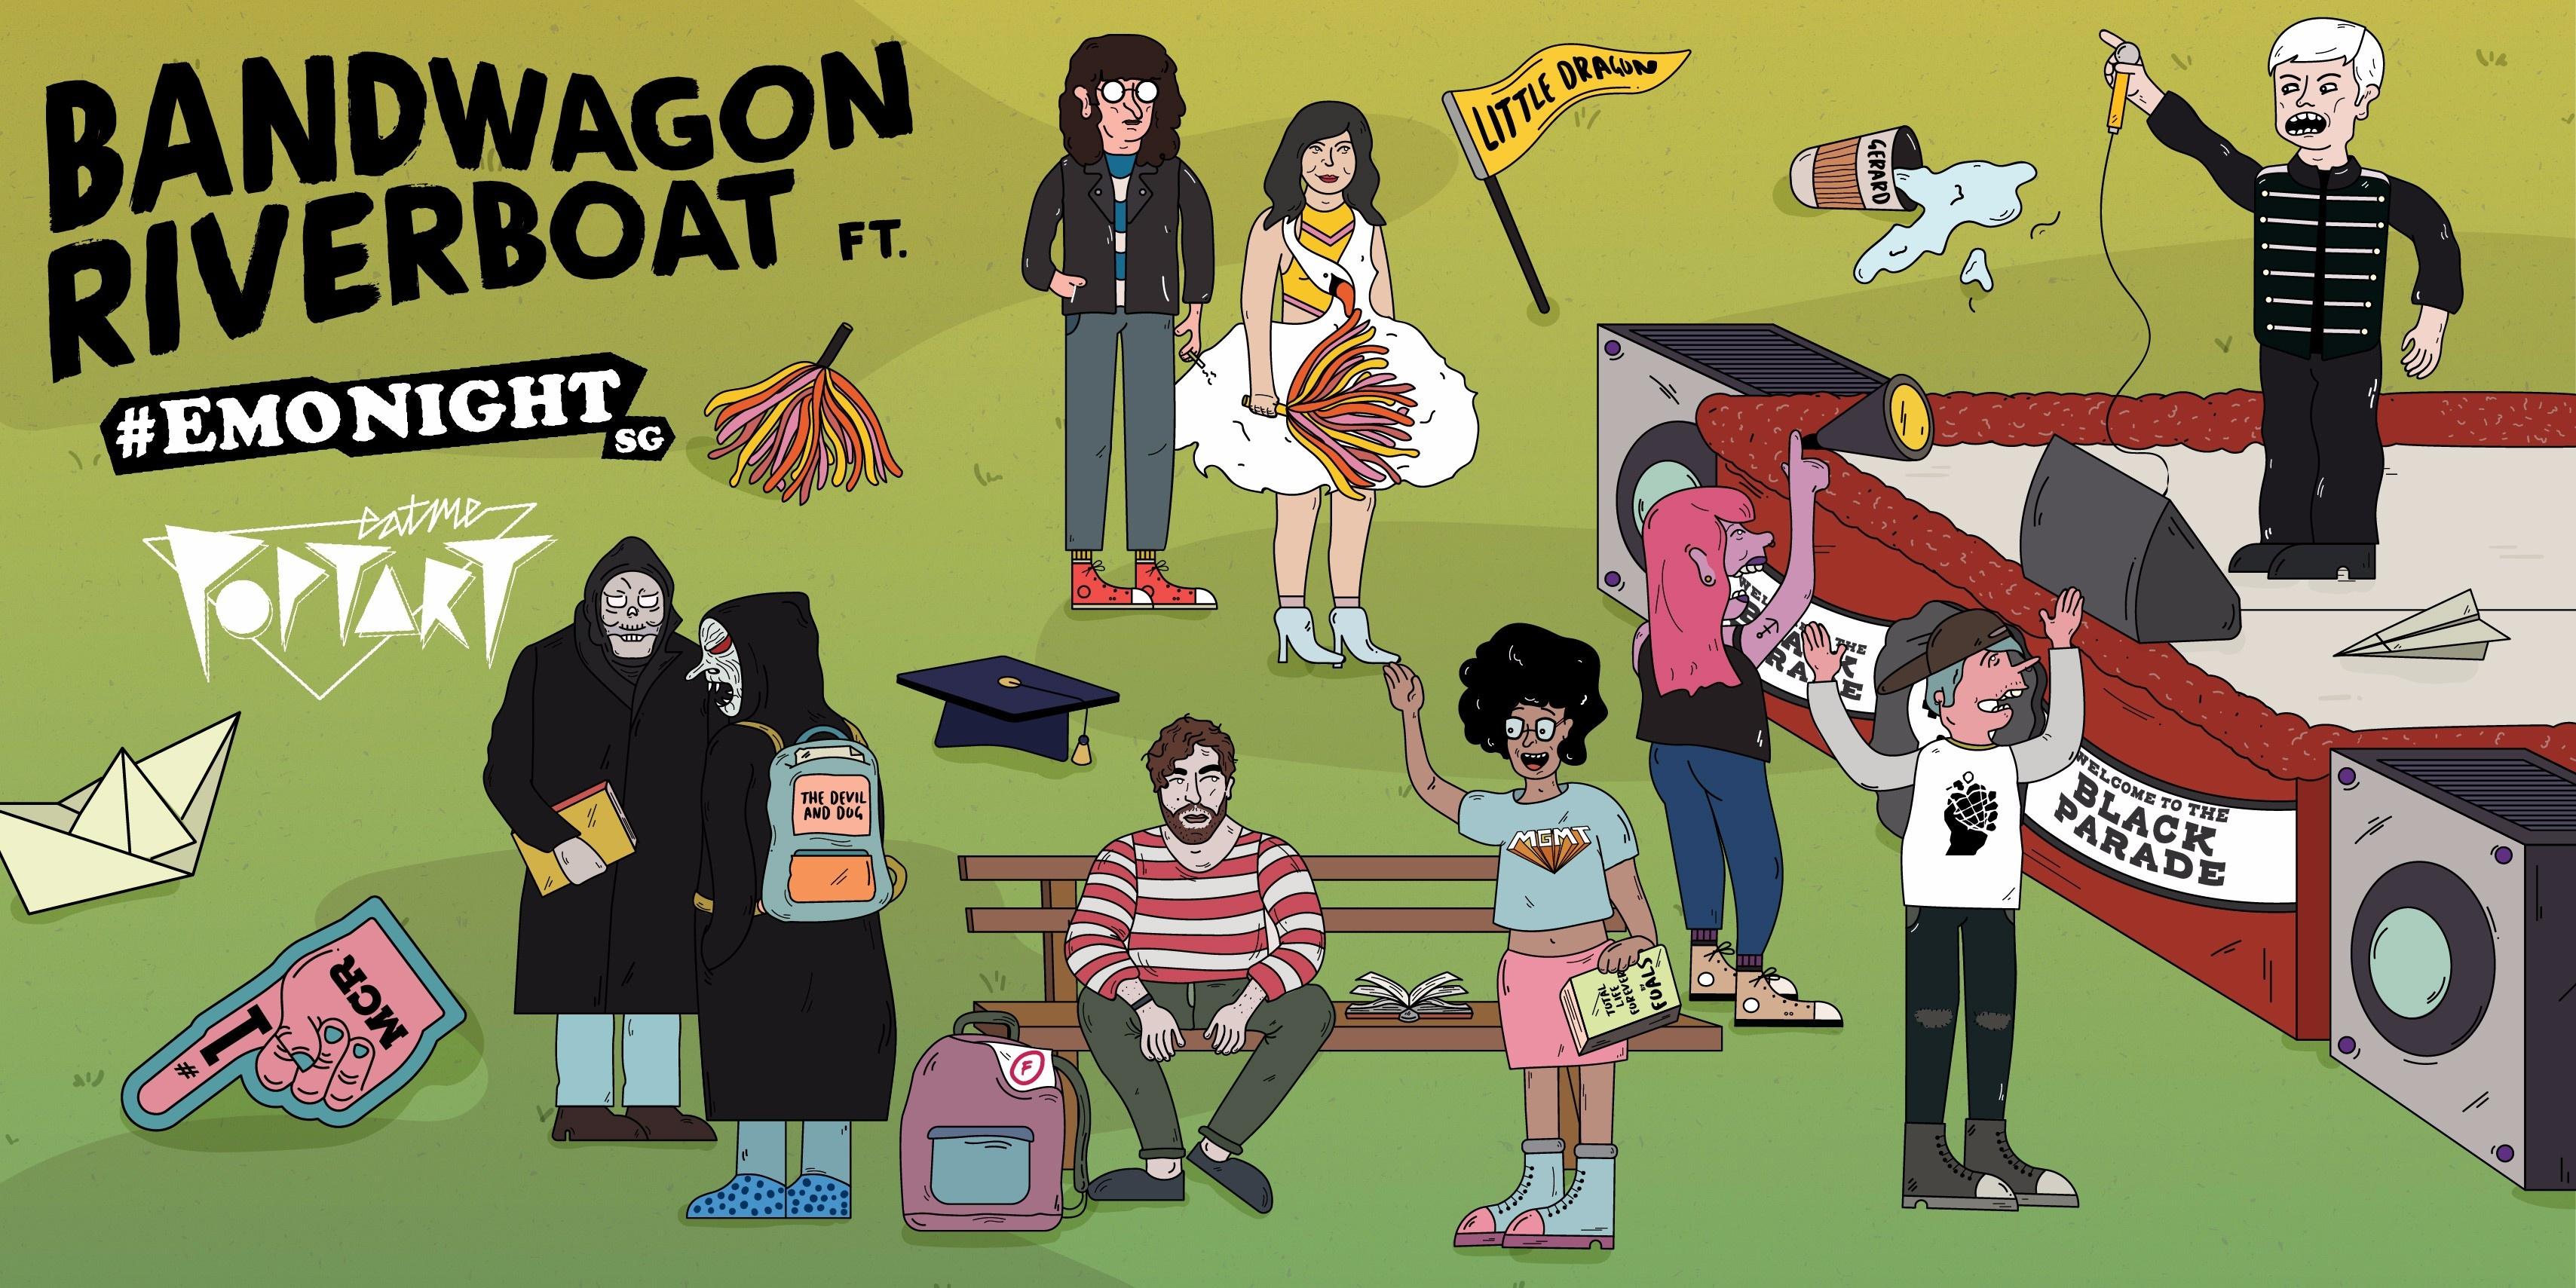 Bandwagon Riverboat goes back to school with EATMEPOPTART & EMONIGHTSG